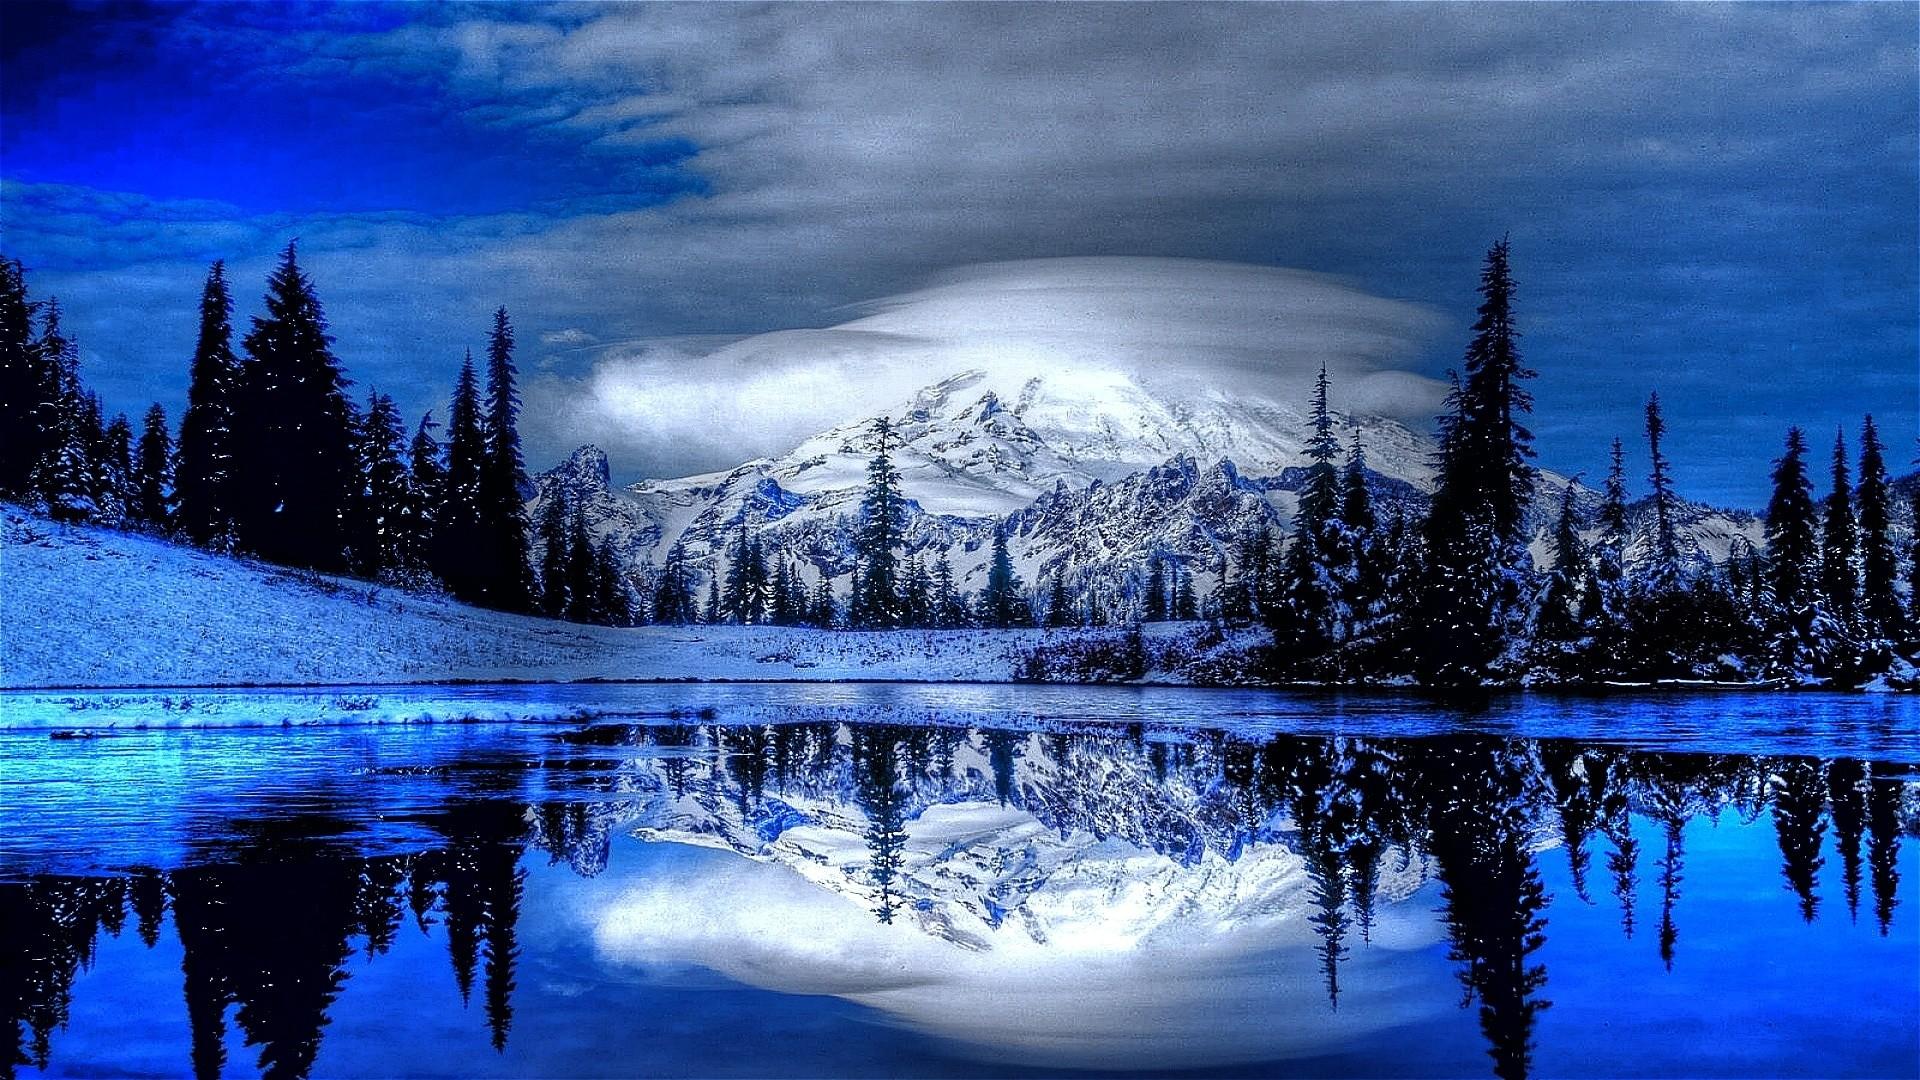 Winter Hd Wallpapers Windows 7